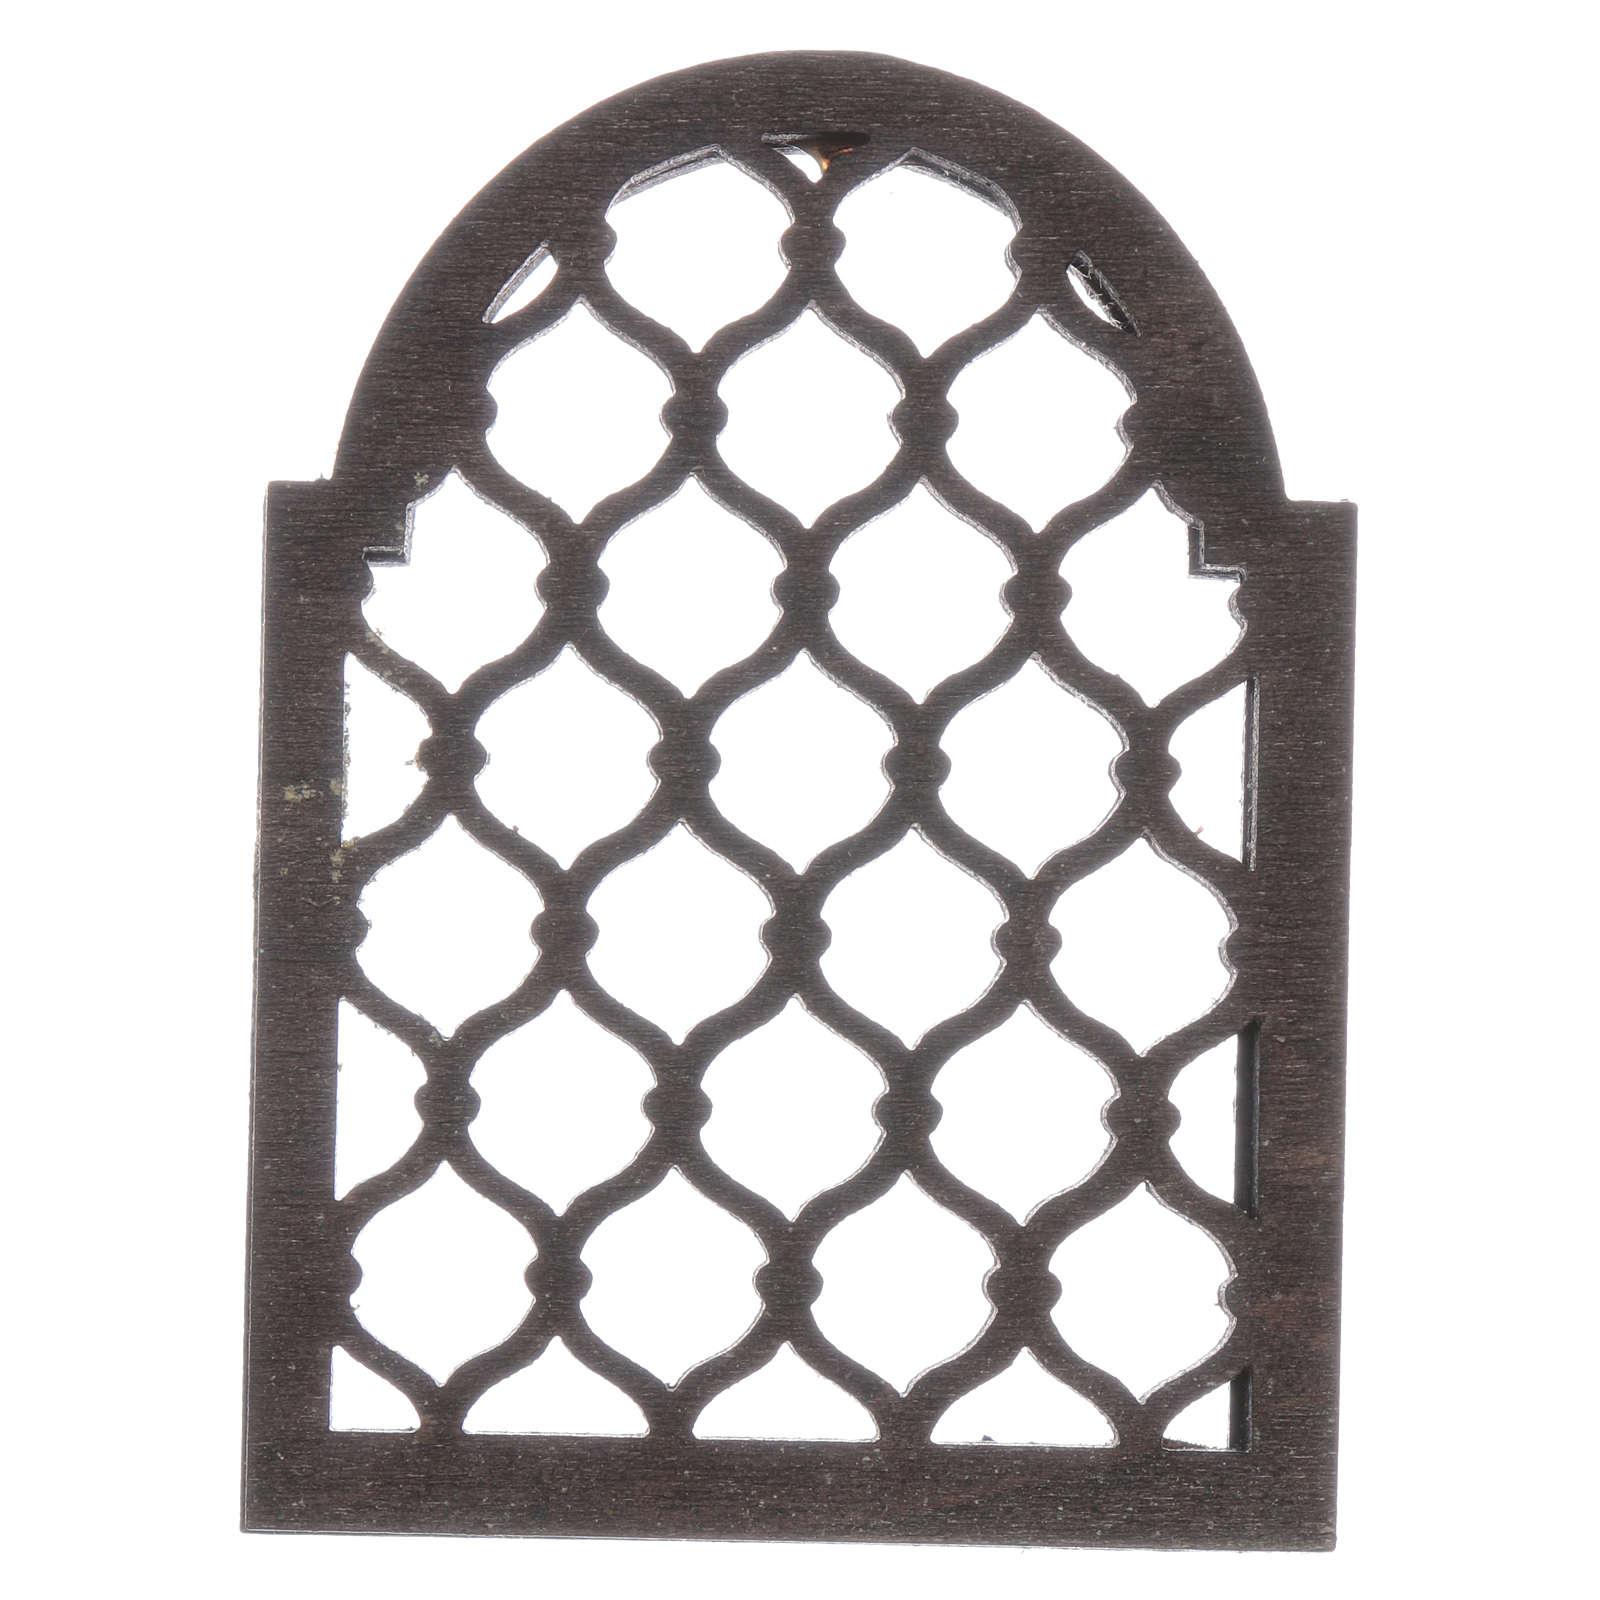 Neapolitan nativity scene accessory Arabian elaborated window 4